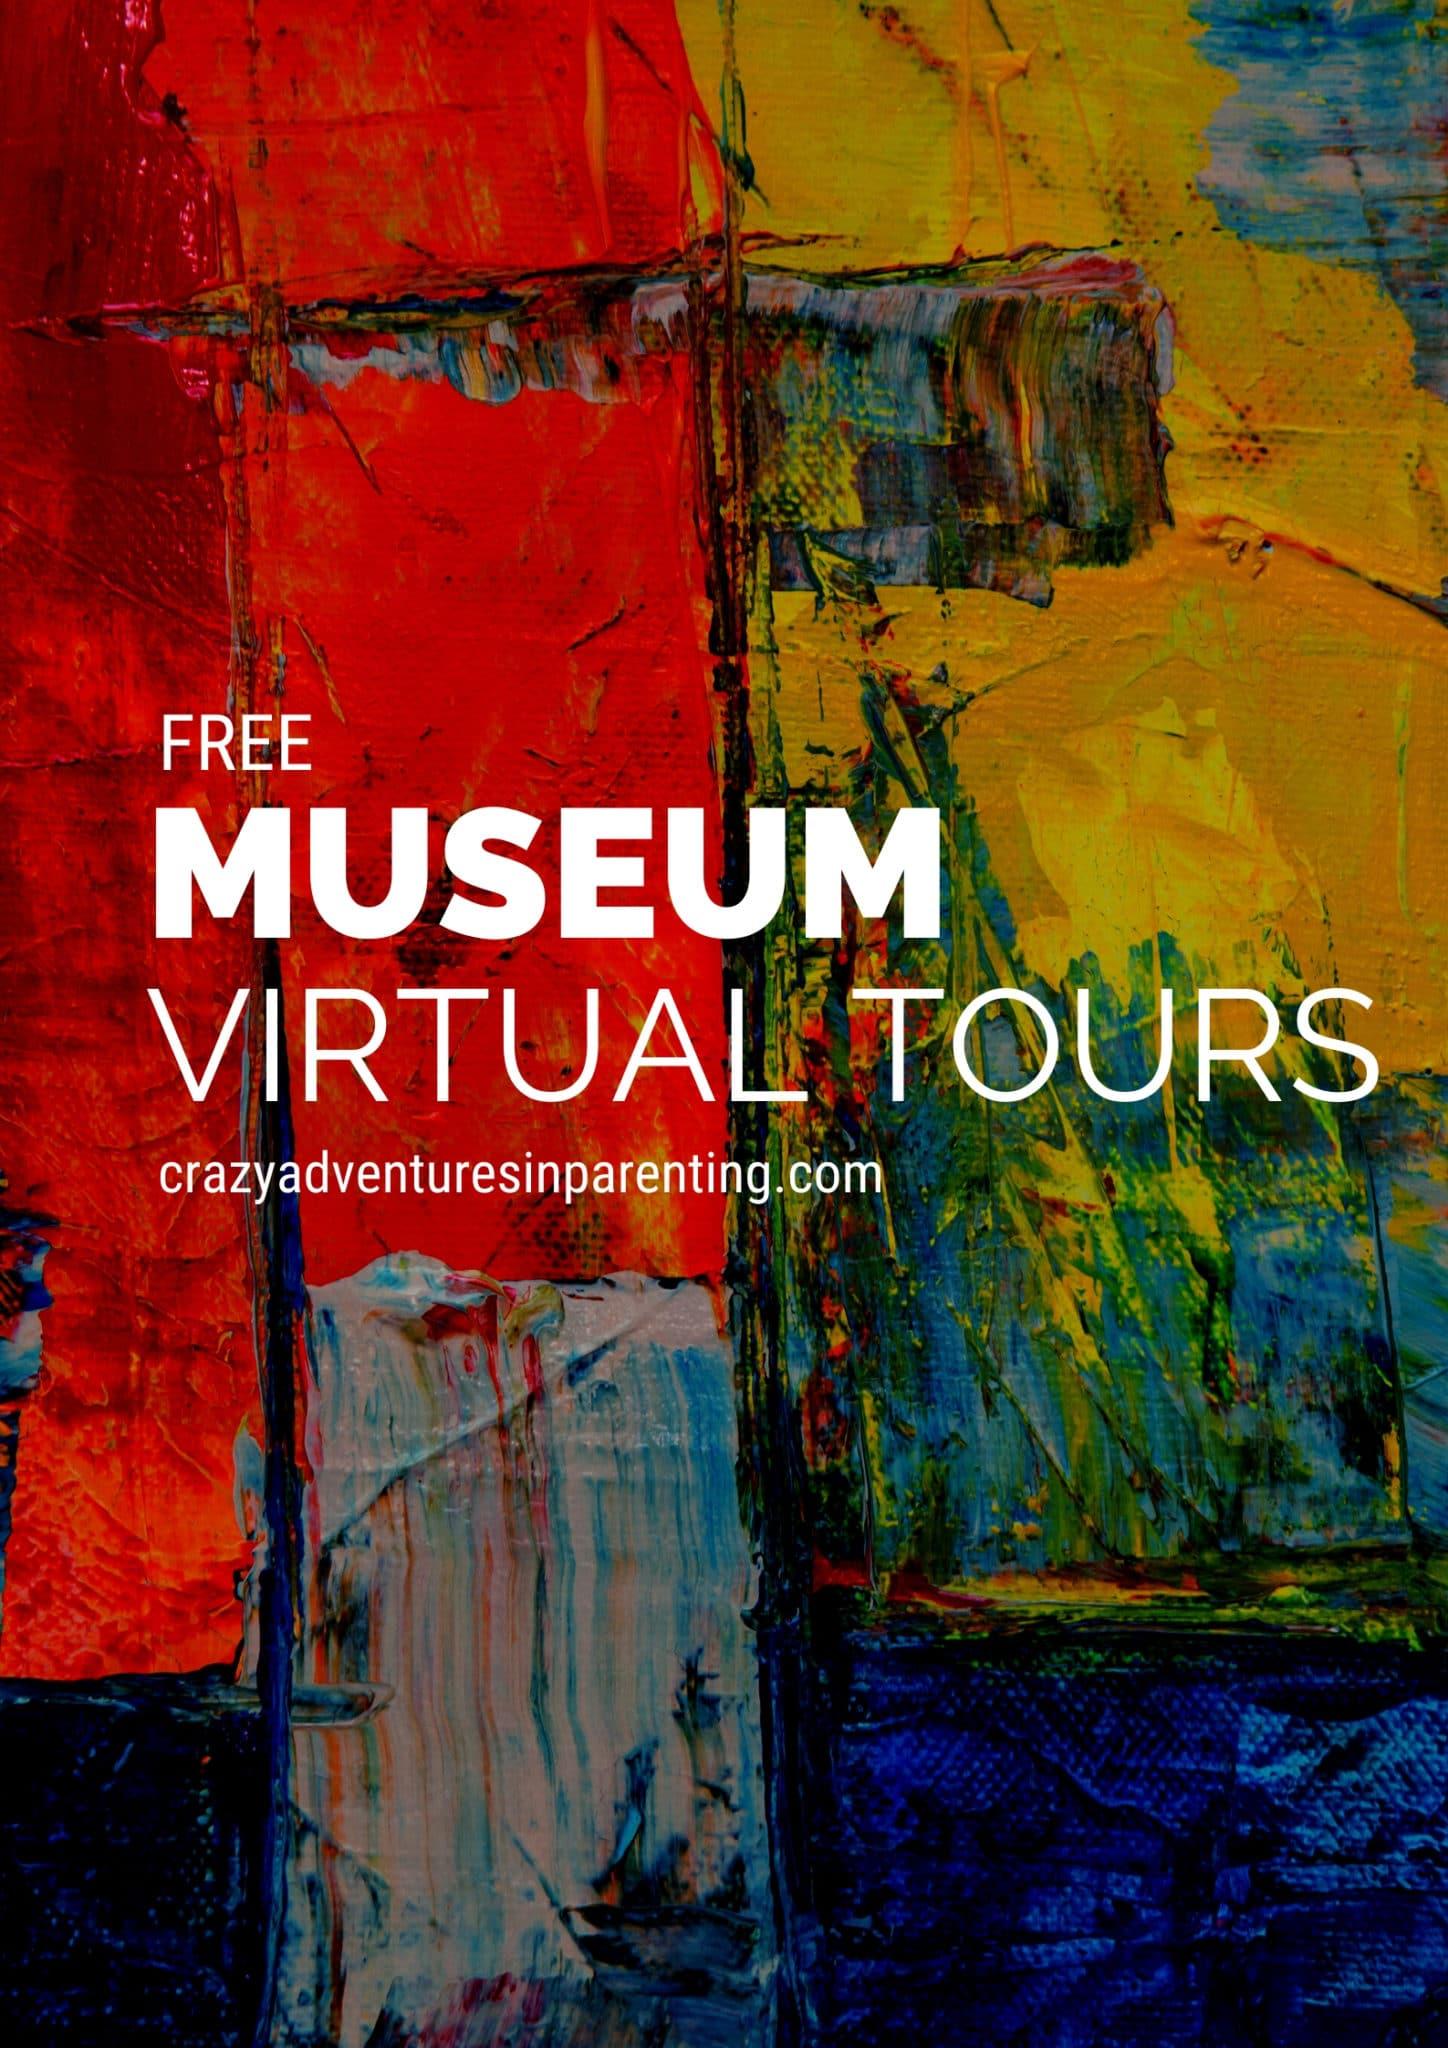 Free Museum Virtual Tours